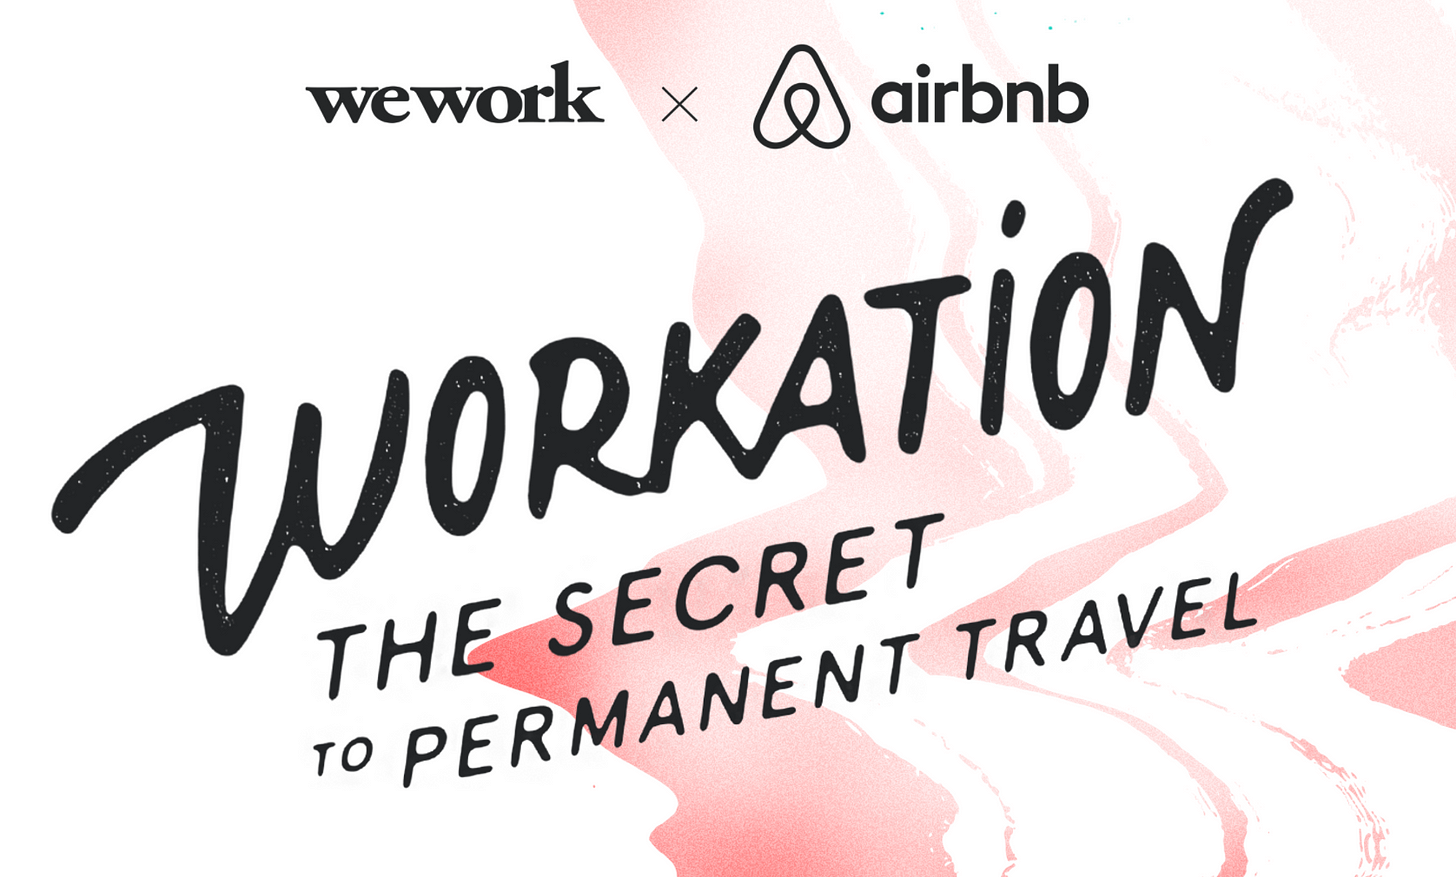 WorkationBOS | Airbnb x WeWork [05/16/17]